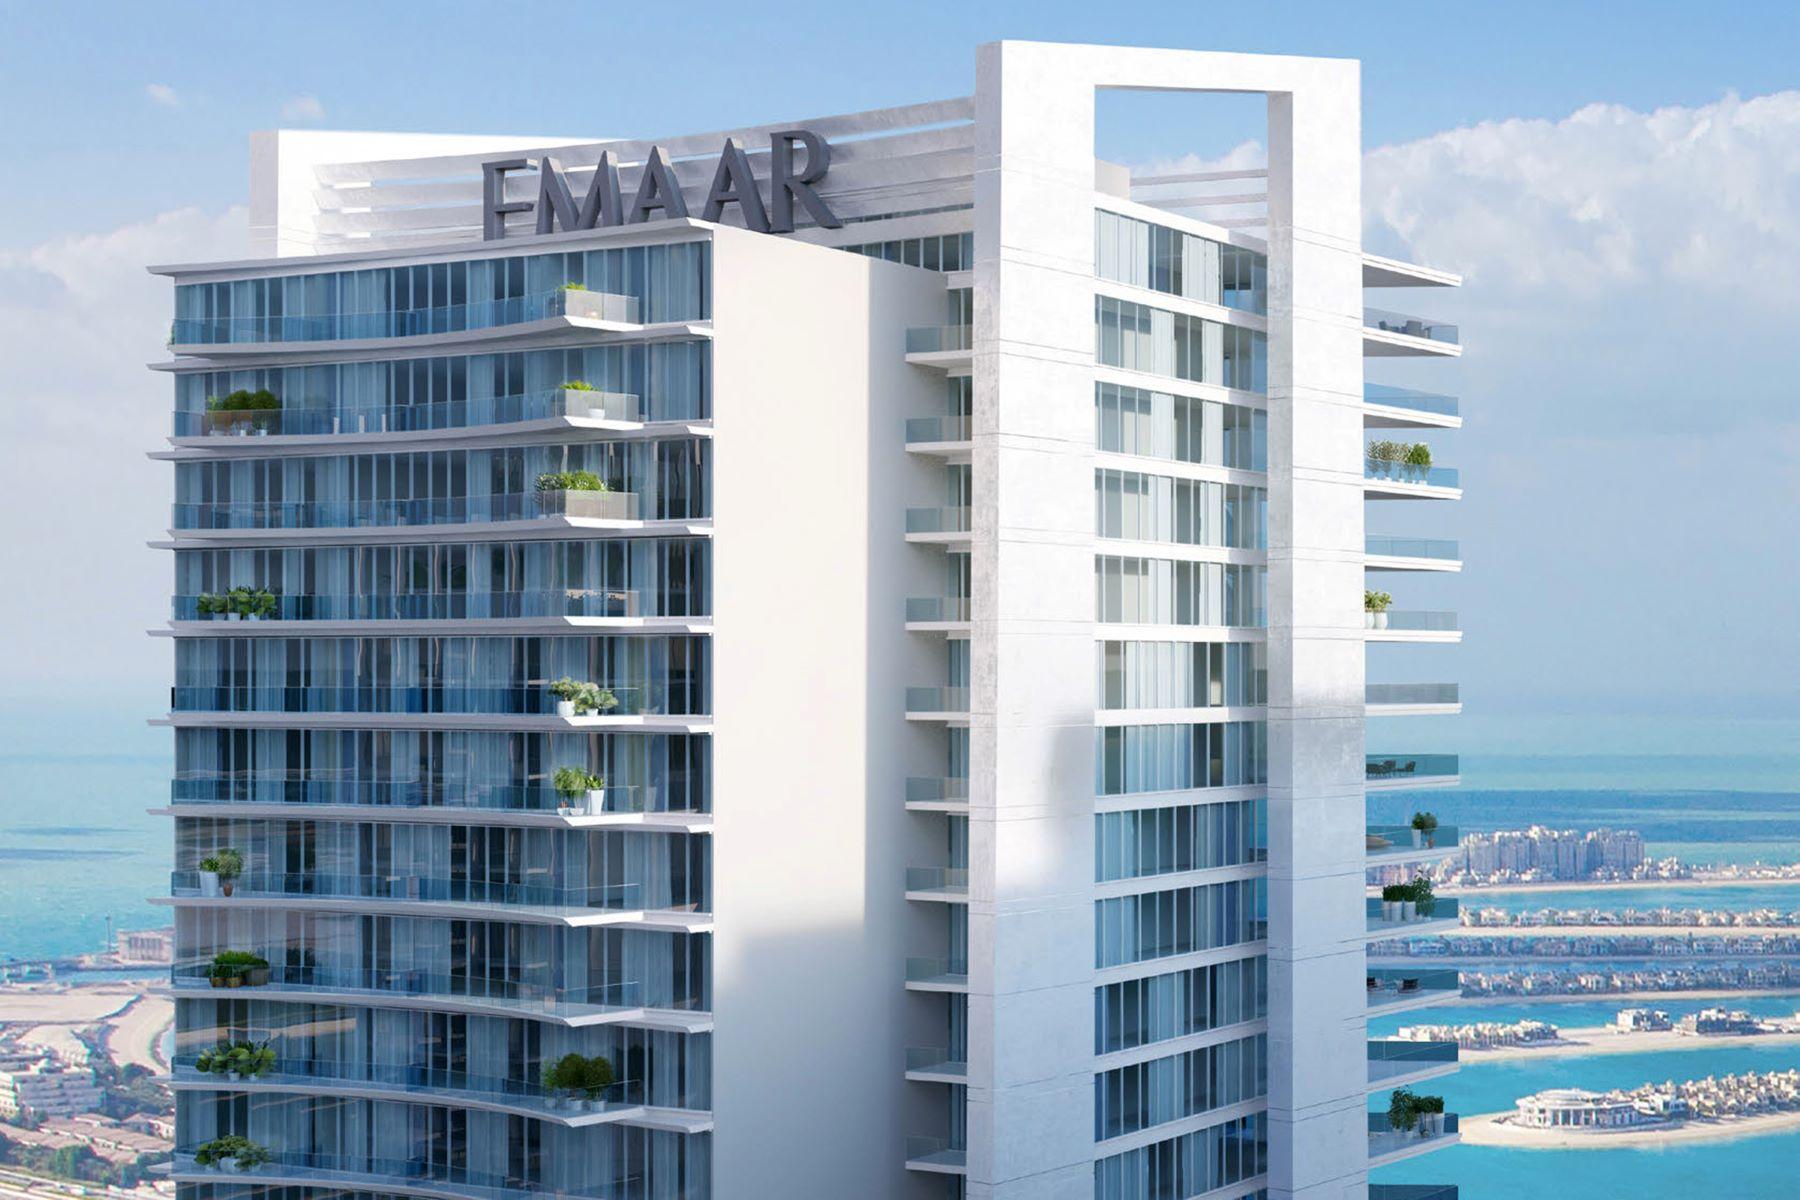 Apartment for Sale at Tower 2 Beach Vista 3 Bedroom Full Sea Views Dubai Harbour Beach Vista Tower 2 Dubai, Dubai 00000 United Arab Emirates